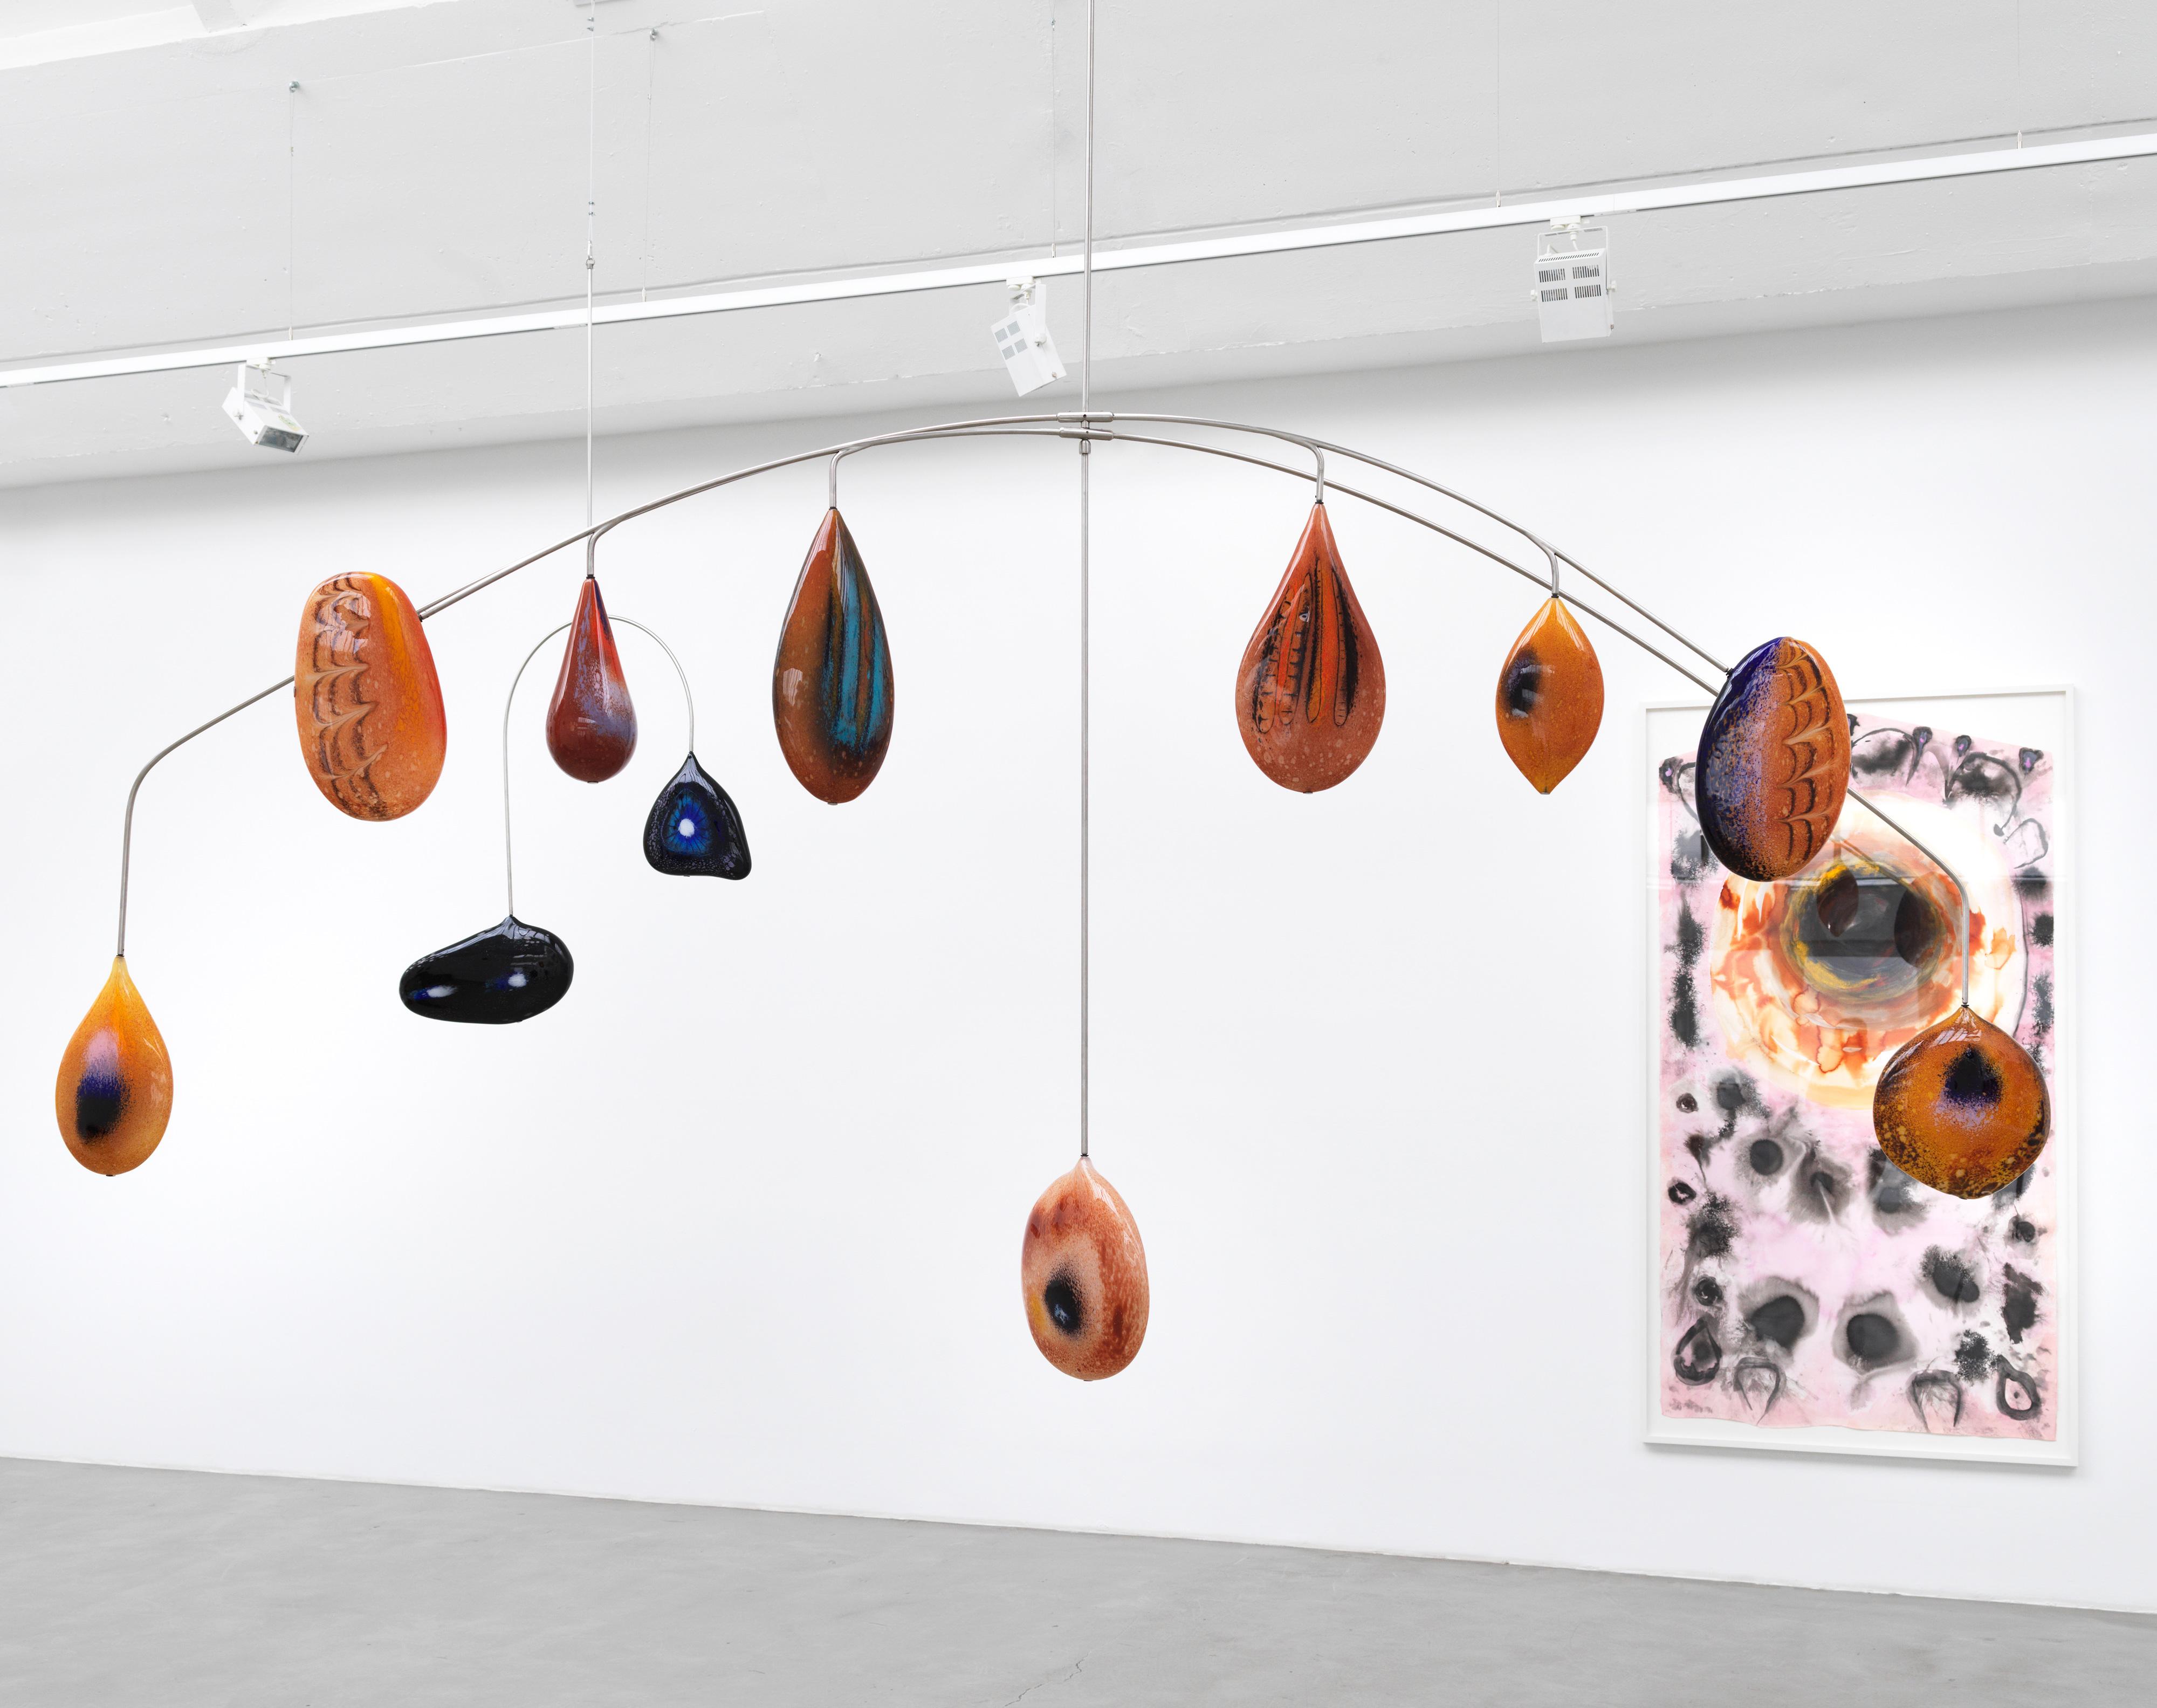 Galerie Barbara Thumm \ María Magdalena Campos-Pons – Mobile #3, 2021, MCP-21-013 \ Mobile #3 (2021)